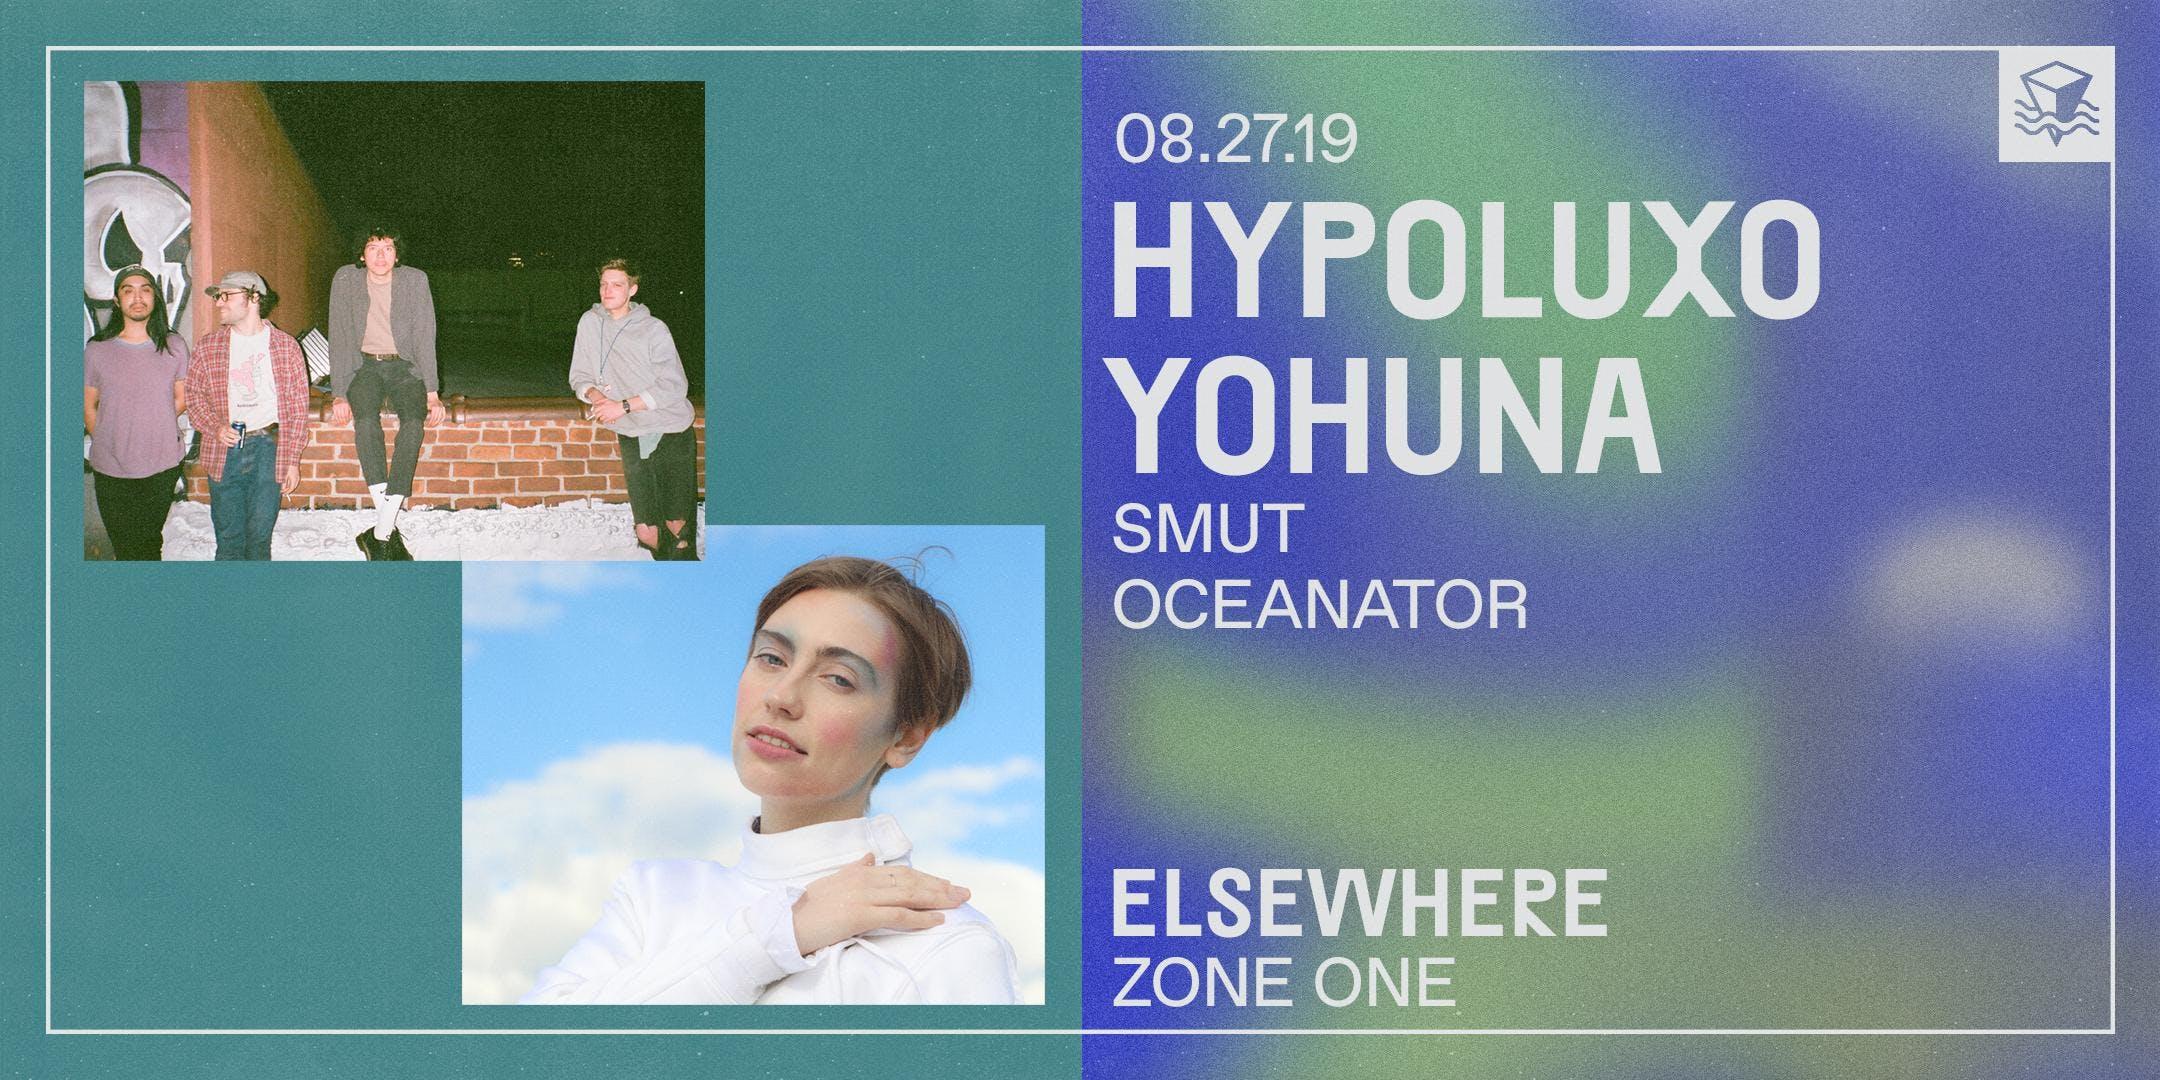 Hypoluxo + Yohuna